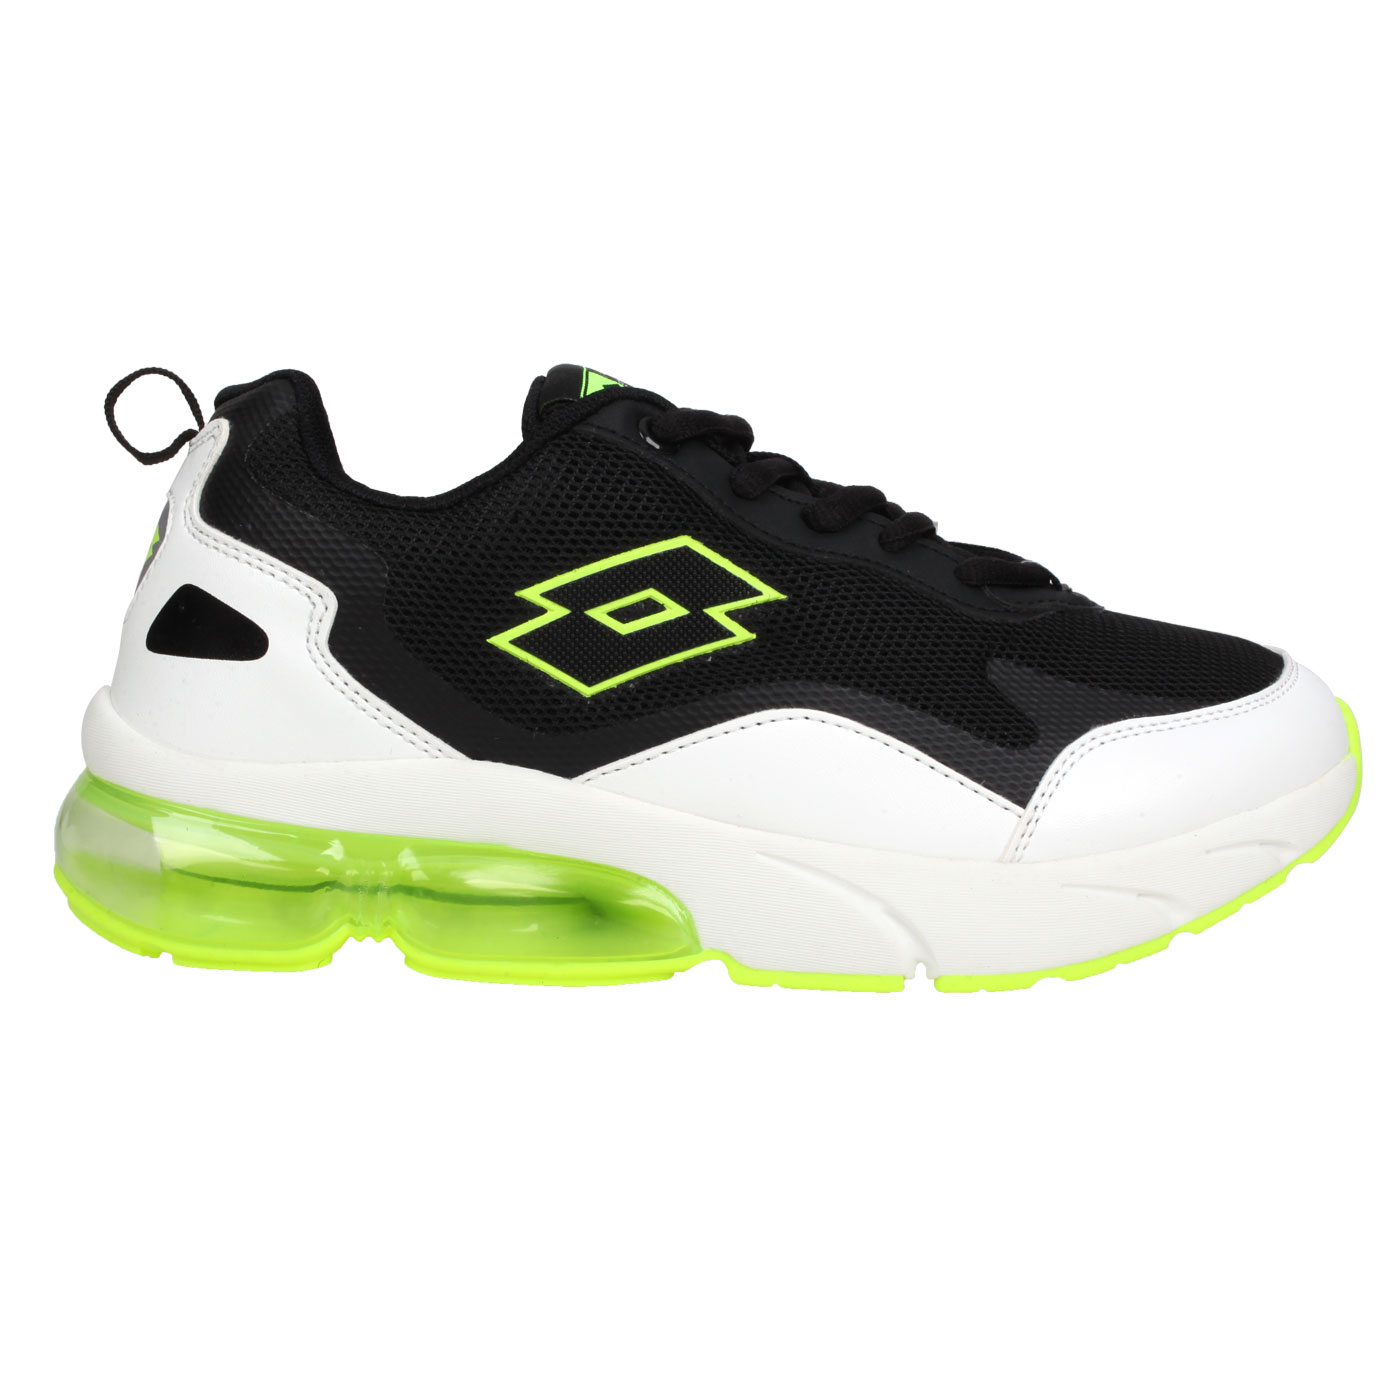 LOTTO 大童氣墊慢跑鞋 LT0AKR2205 - 白黑螢光綠